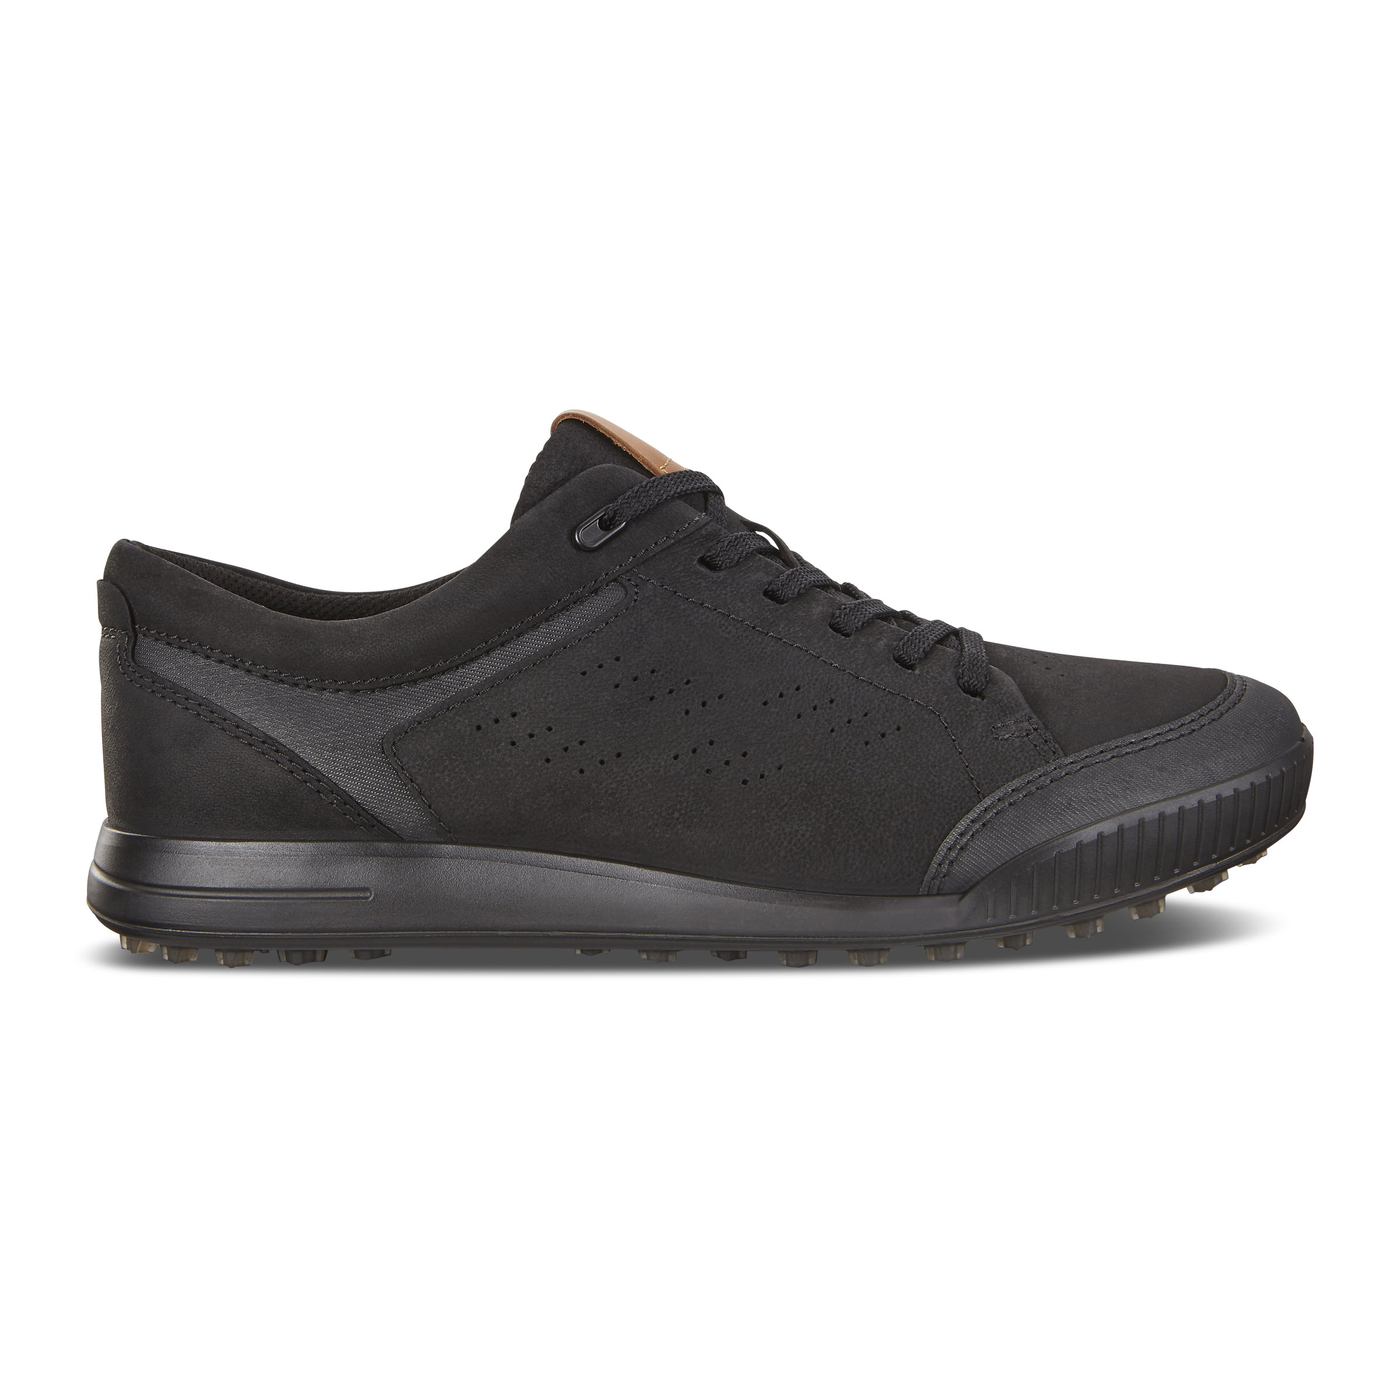 ECCO GOLF STREET RETRO Men's Shoe